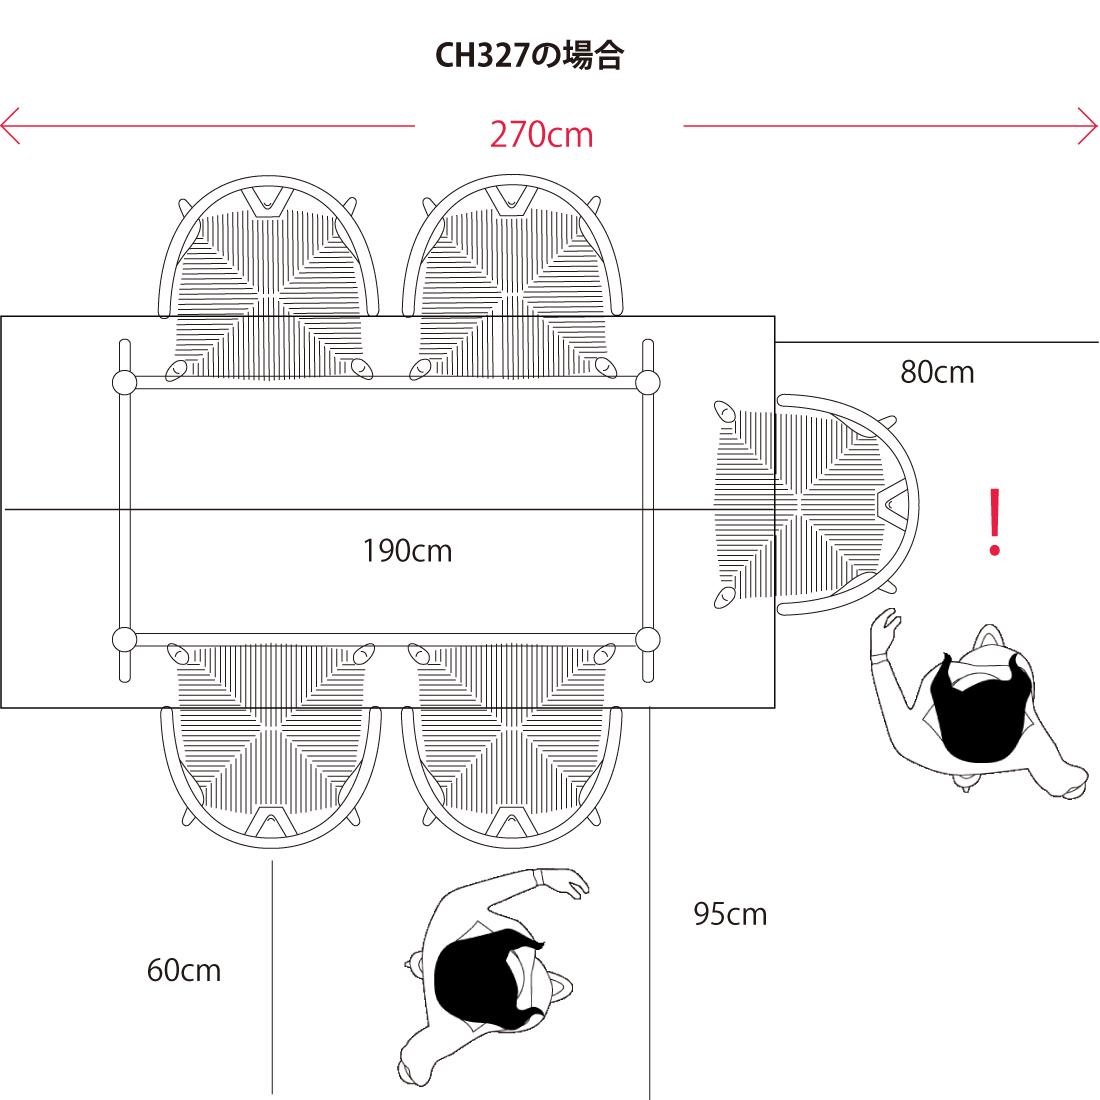 ch006とch327の配置比較のイラスト